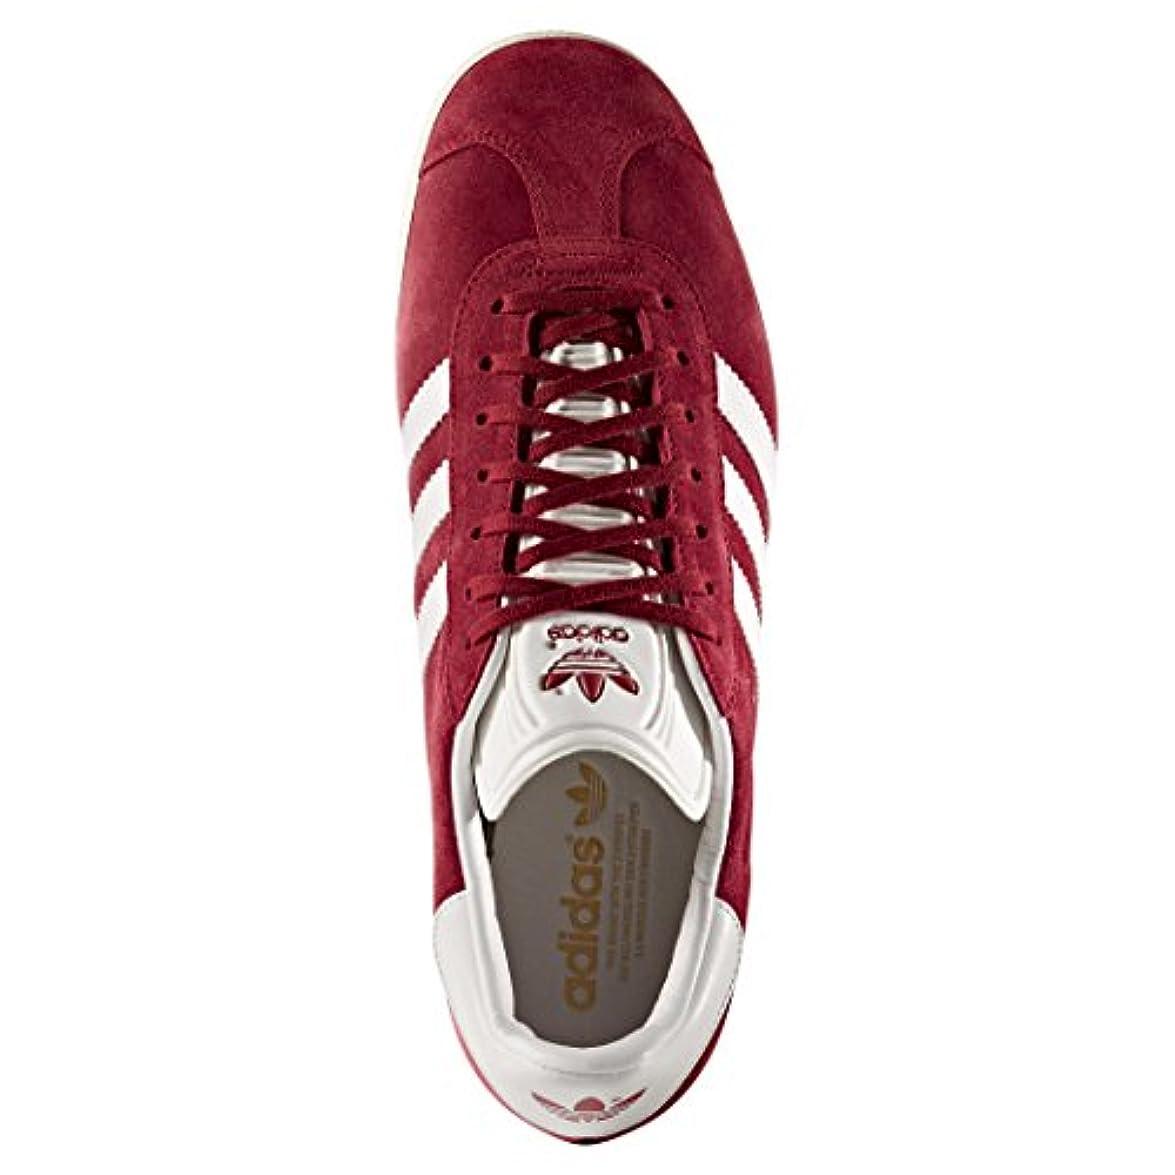 Adidas Originals Gazelle Collegiate Burgundy white gold Metallic